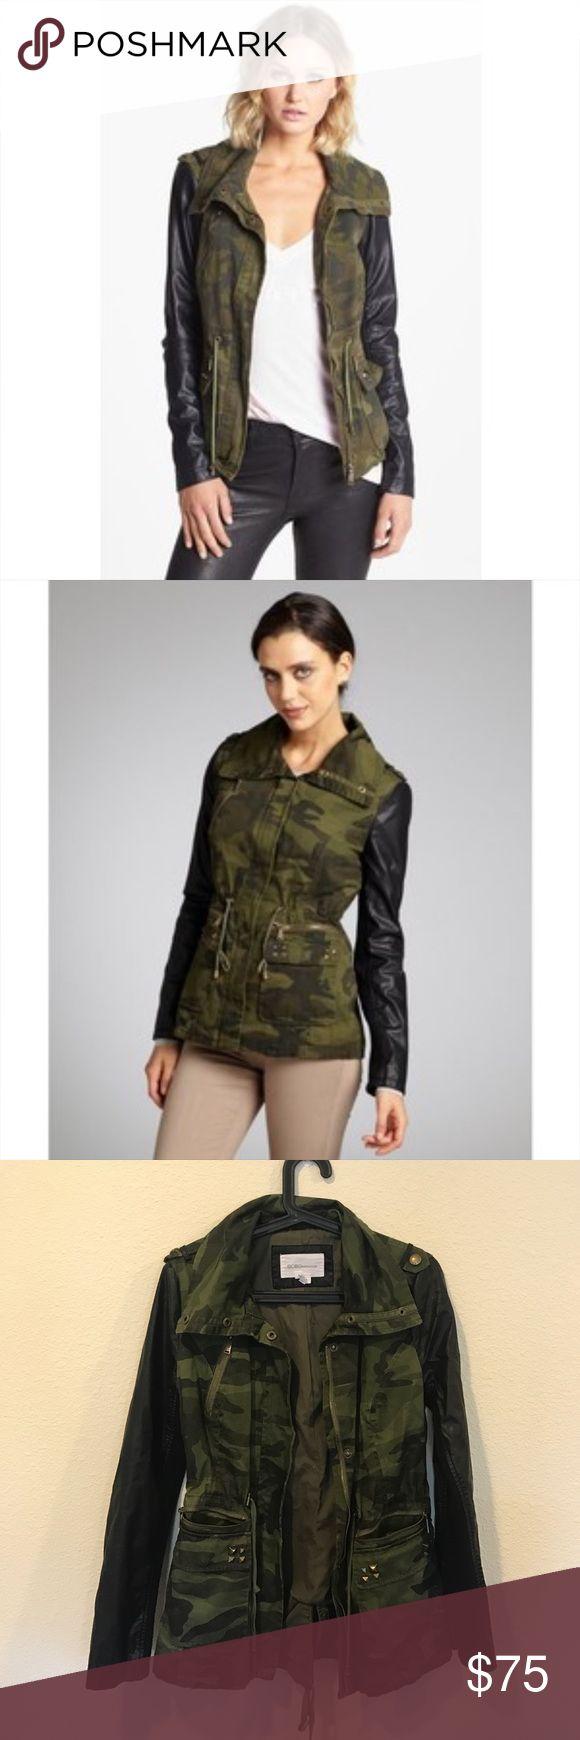 Bcbgeneration camp and leather anorak jacket coat From Brighton the Day blog. No trades. BCBGeneration Jackets & Coats Utility Jackets